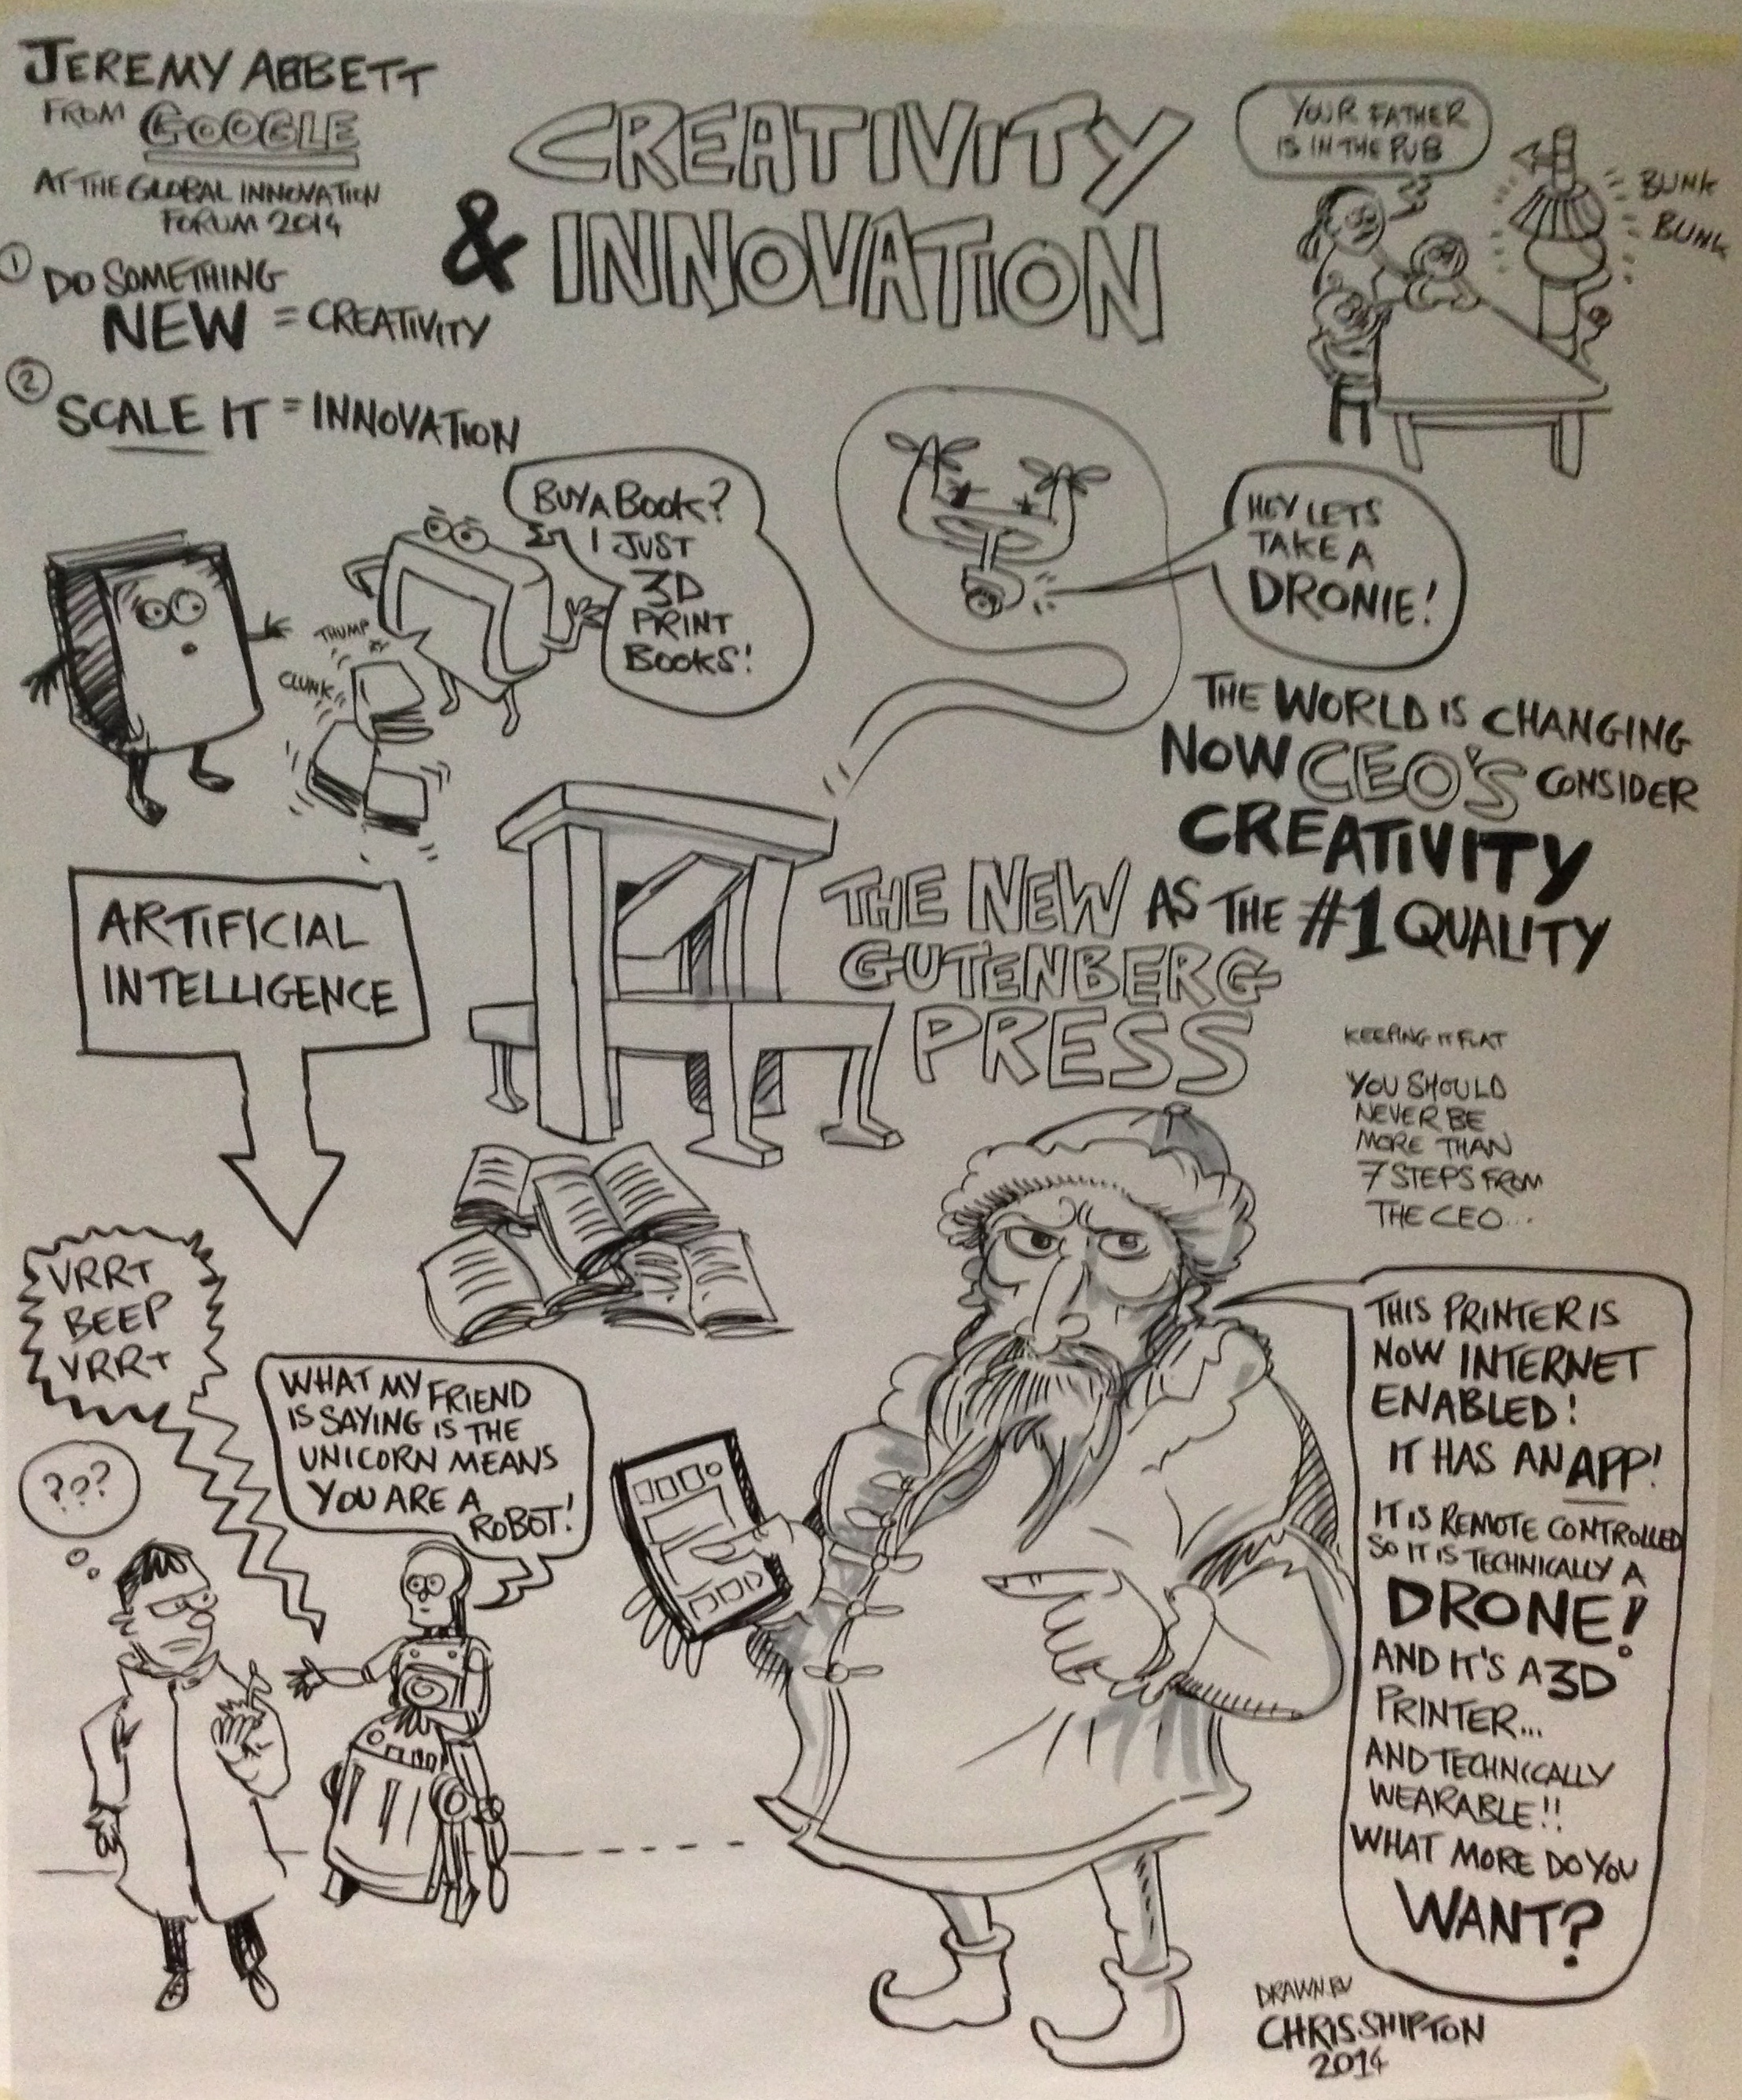 2014 Global Innovation Forum